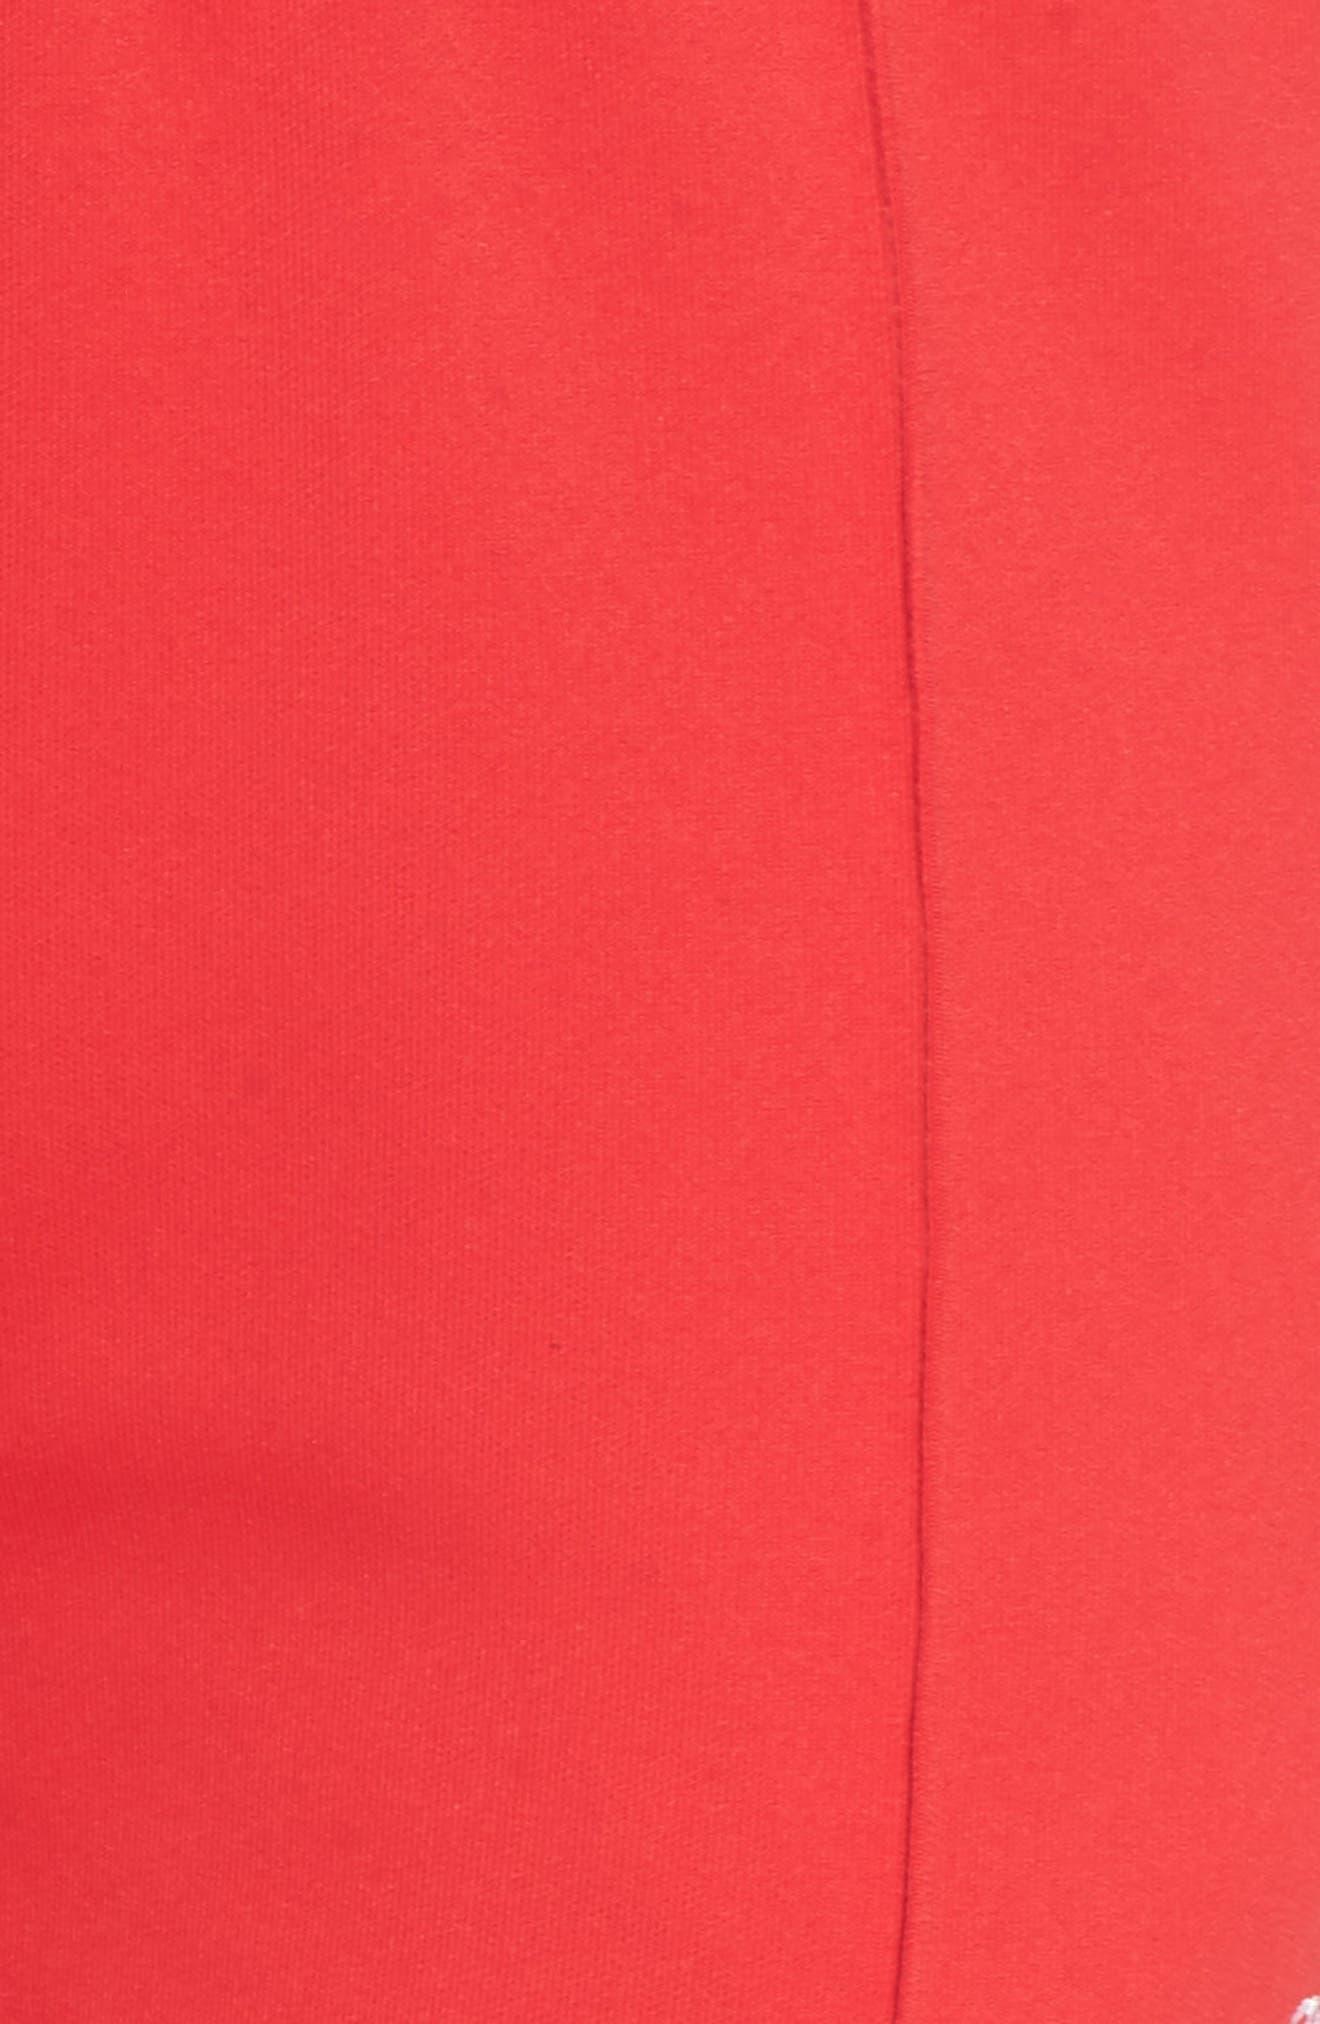 ,                             adidas SST Track Pants,                             Alternate thumbnail 71, color,                             600